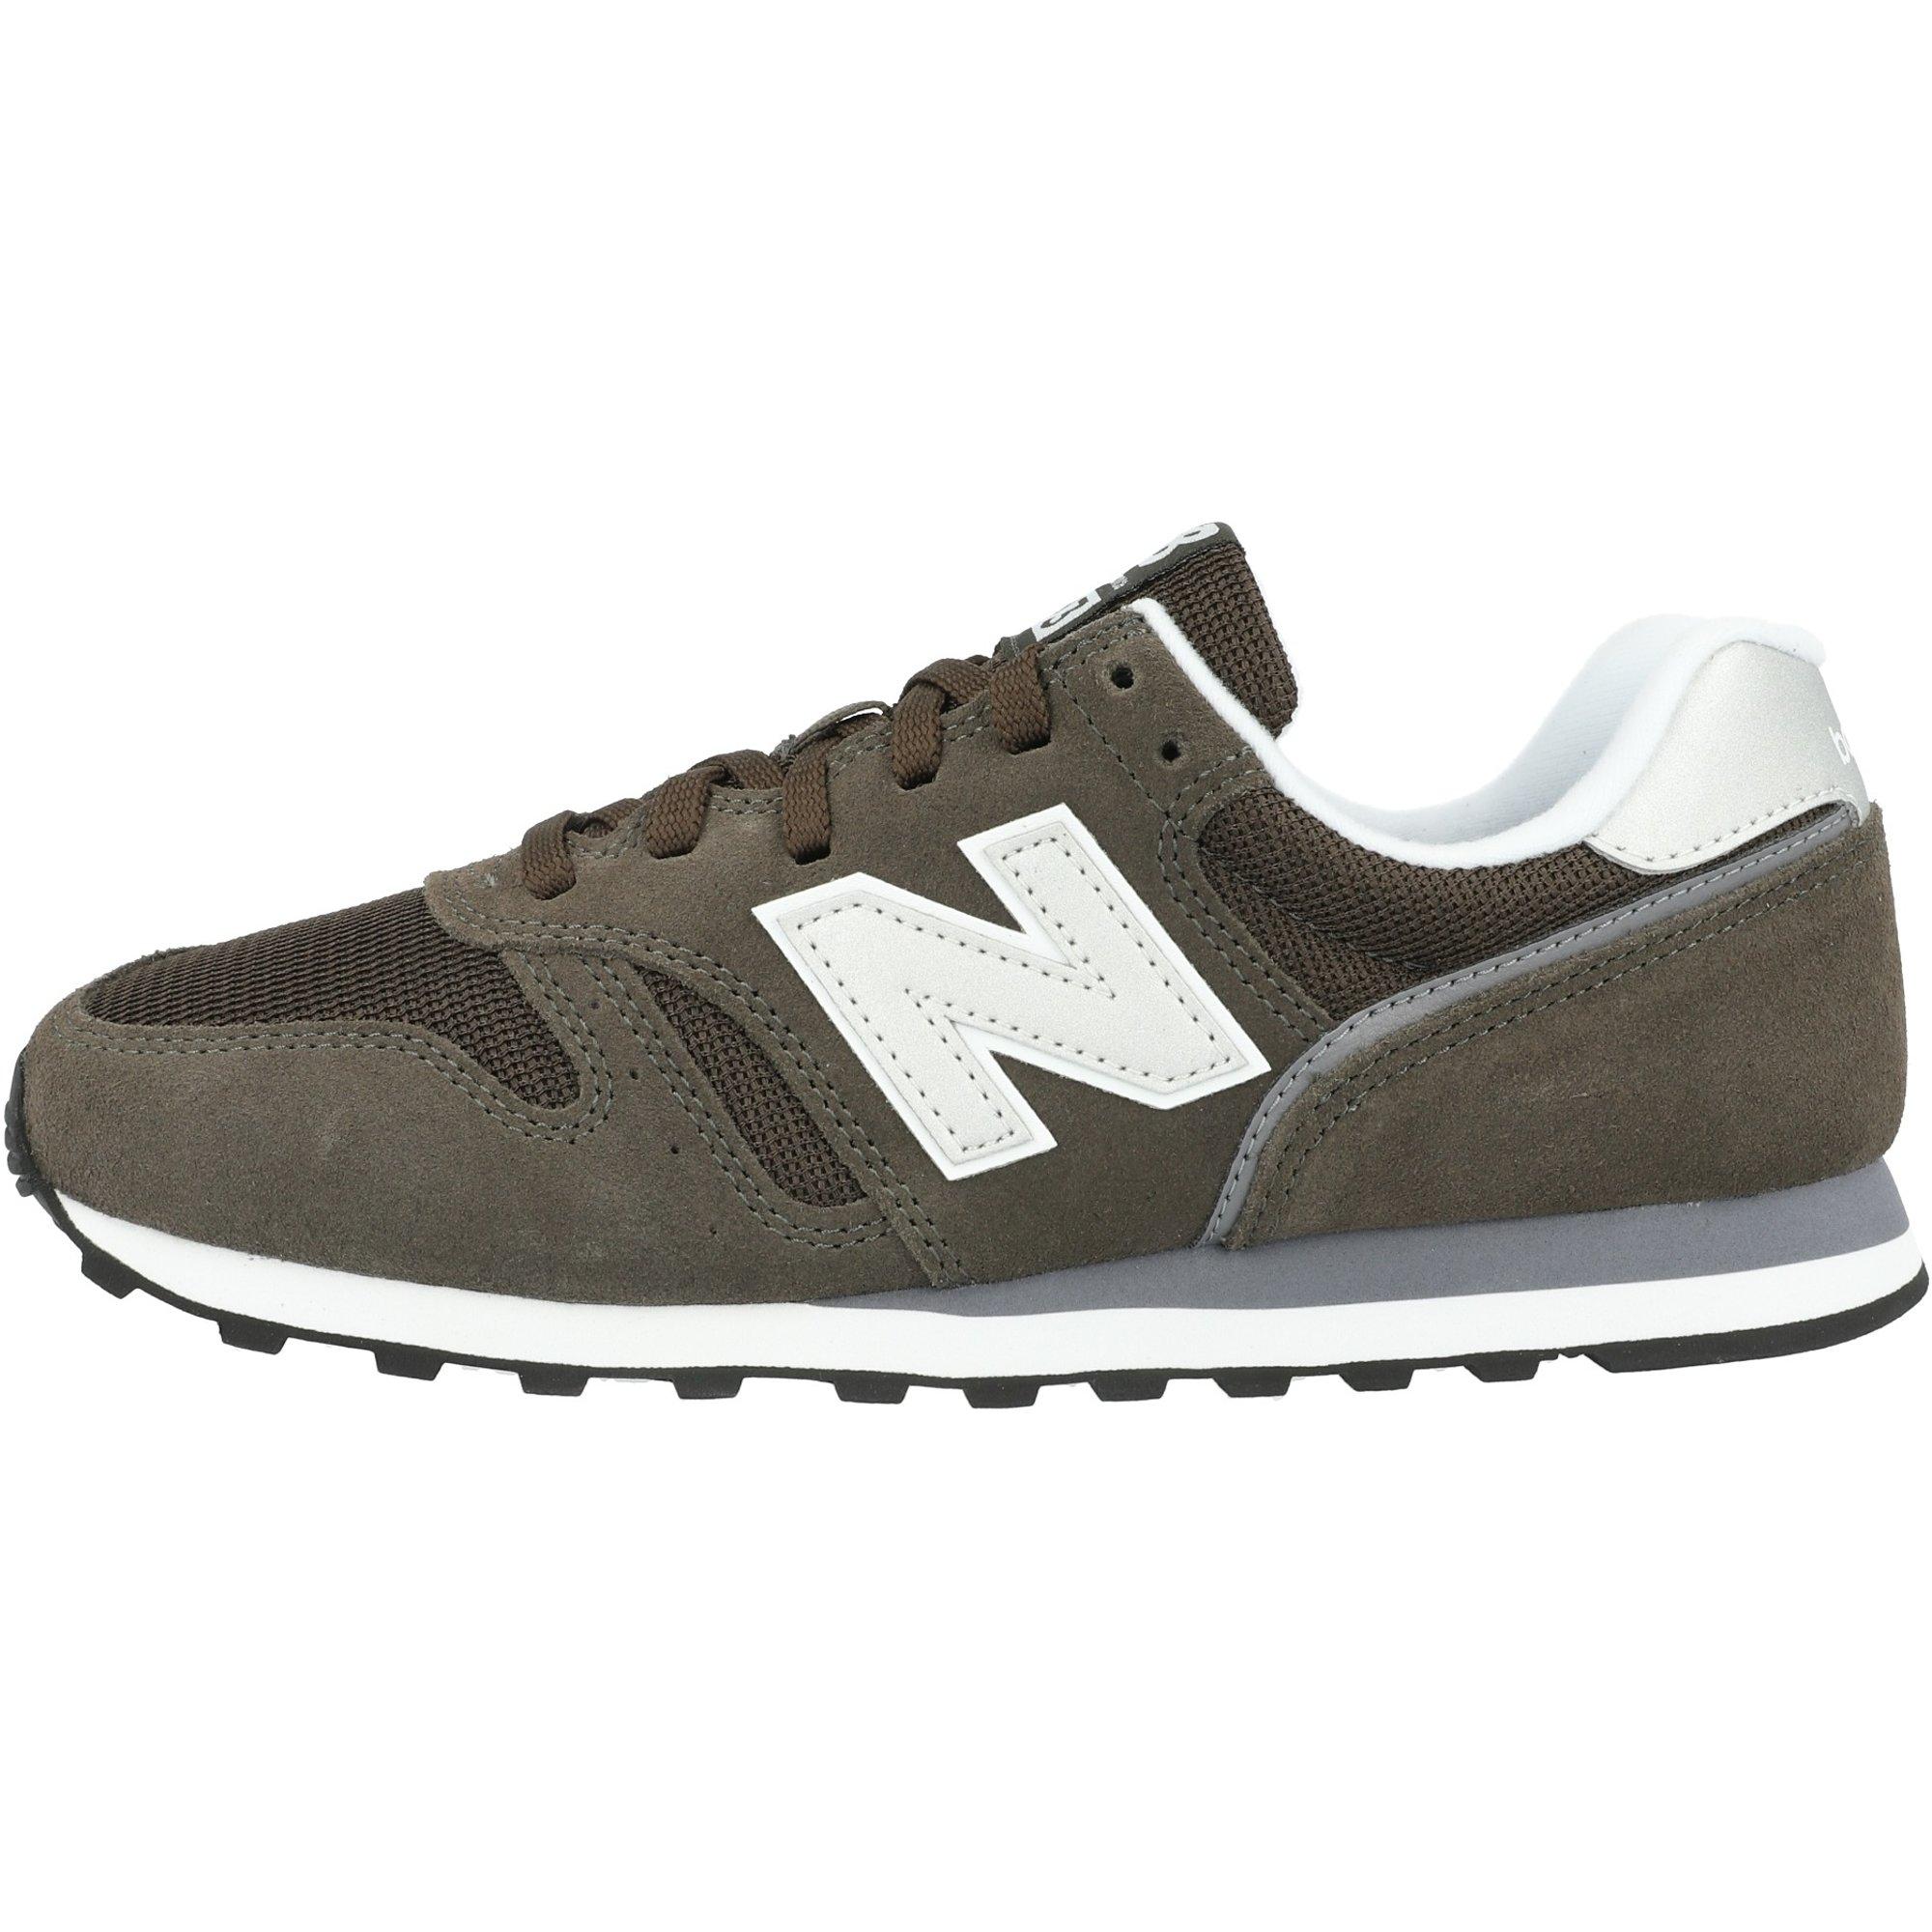 New Balance 373 Black Olive/White Suede